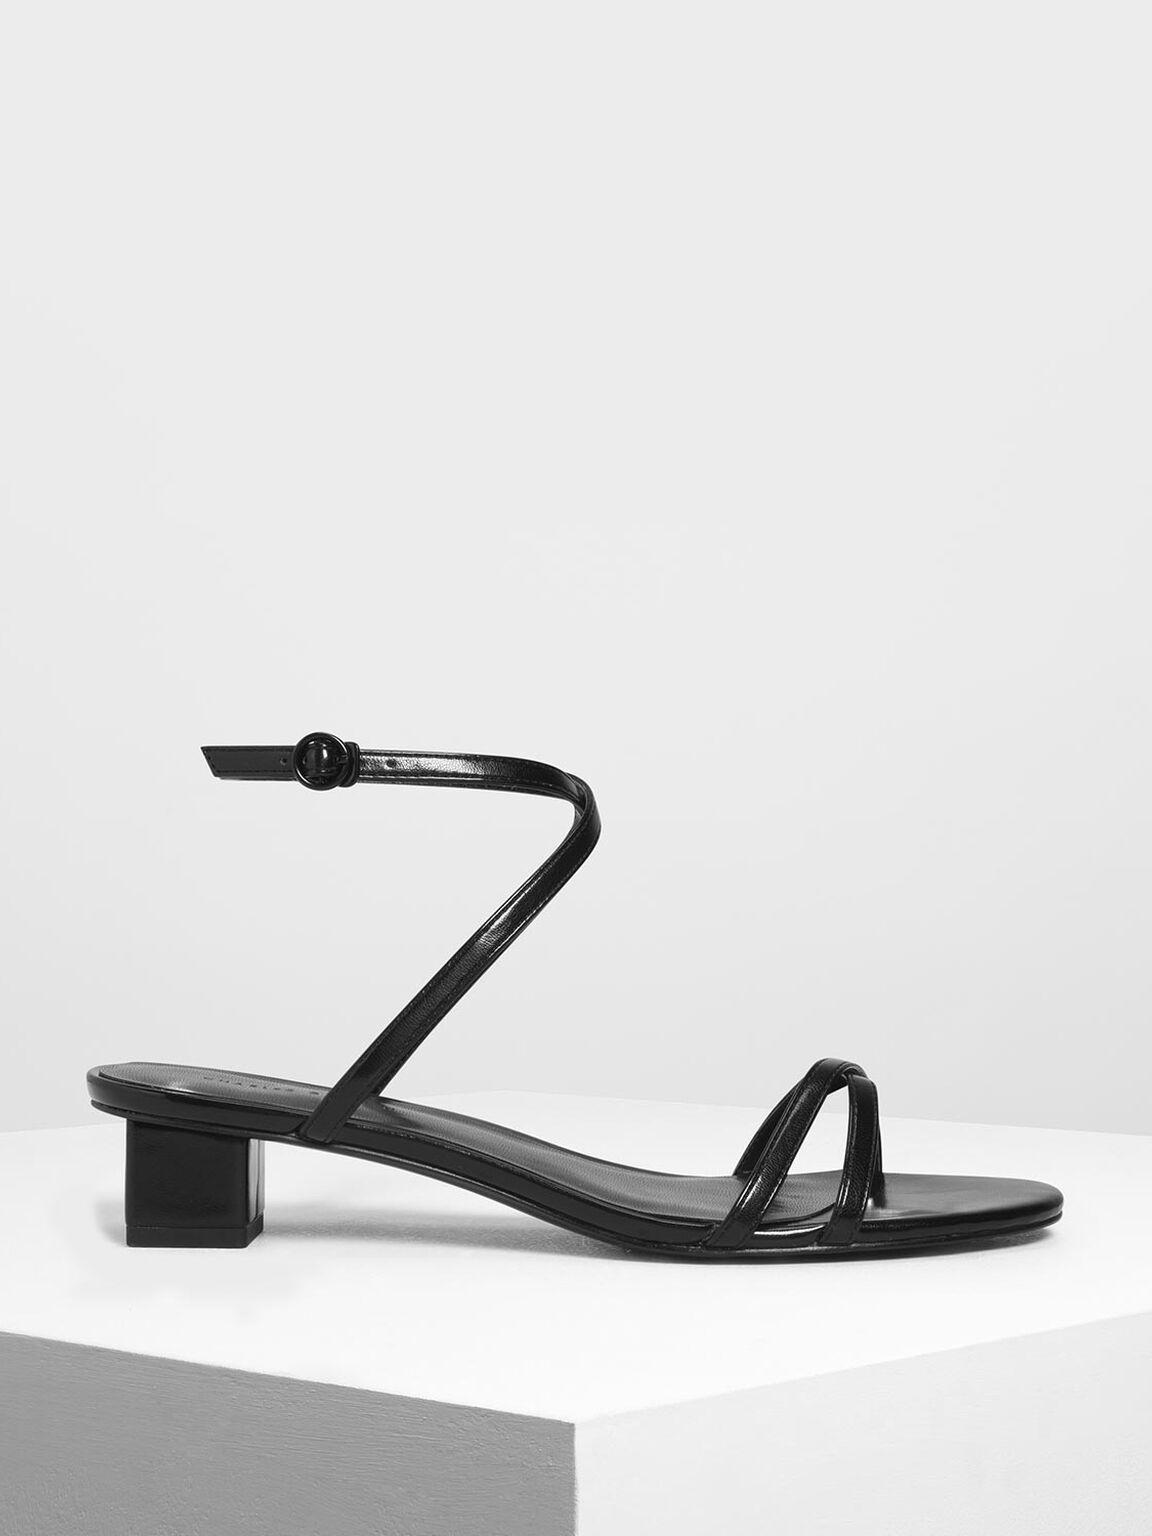 Criss Cross Low Heel Sandals, Black, hi-res